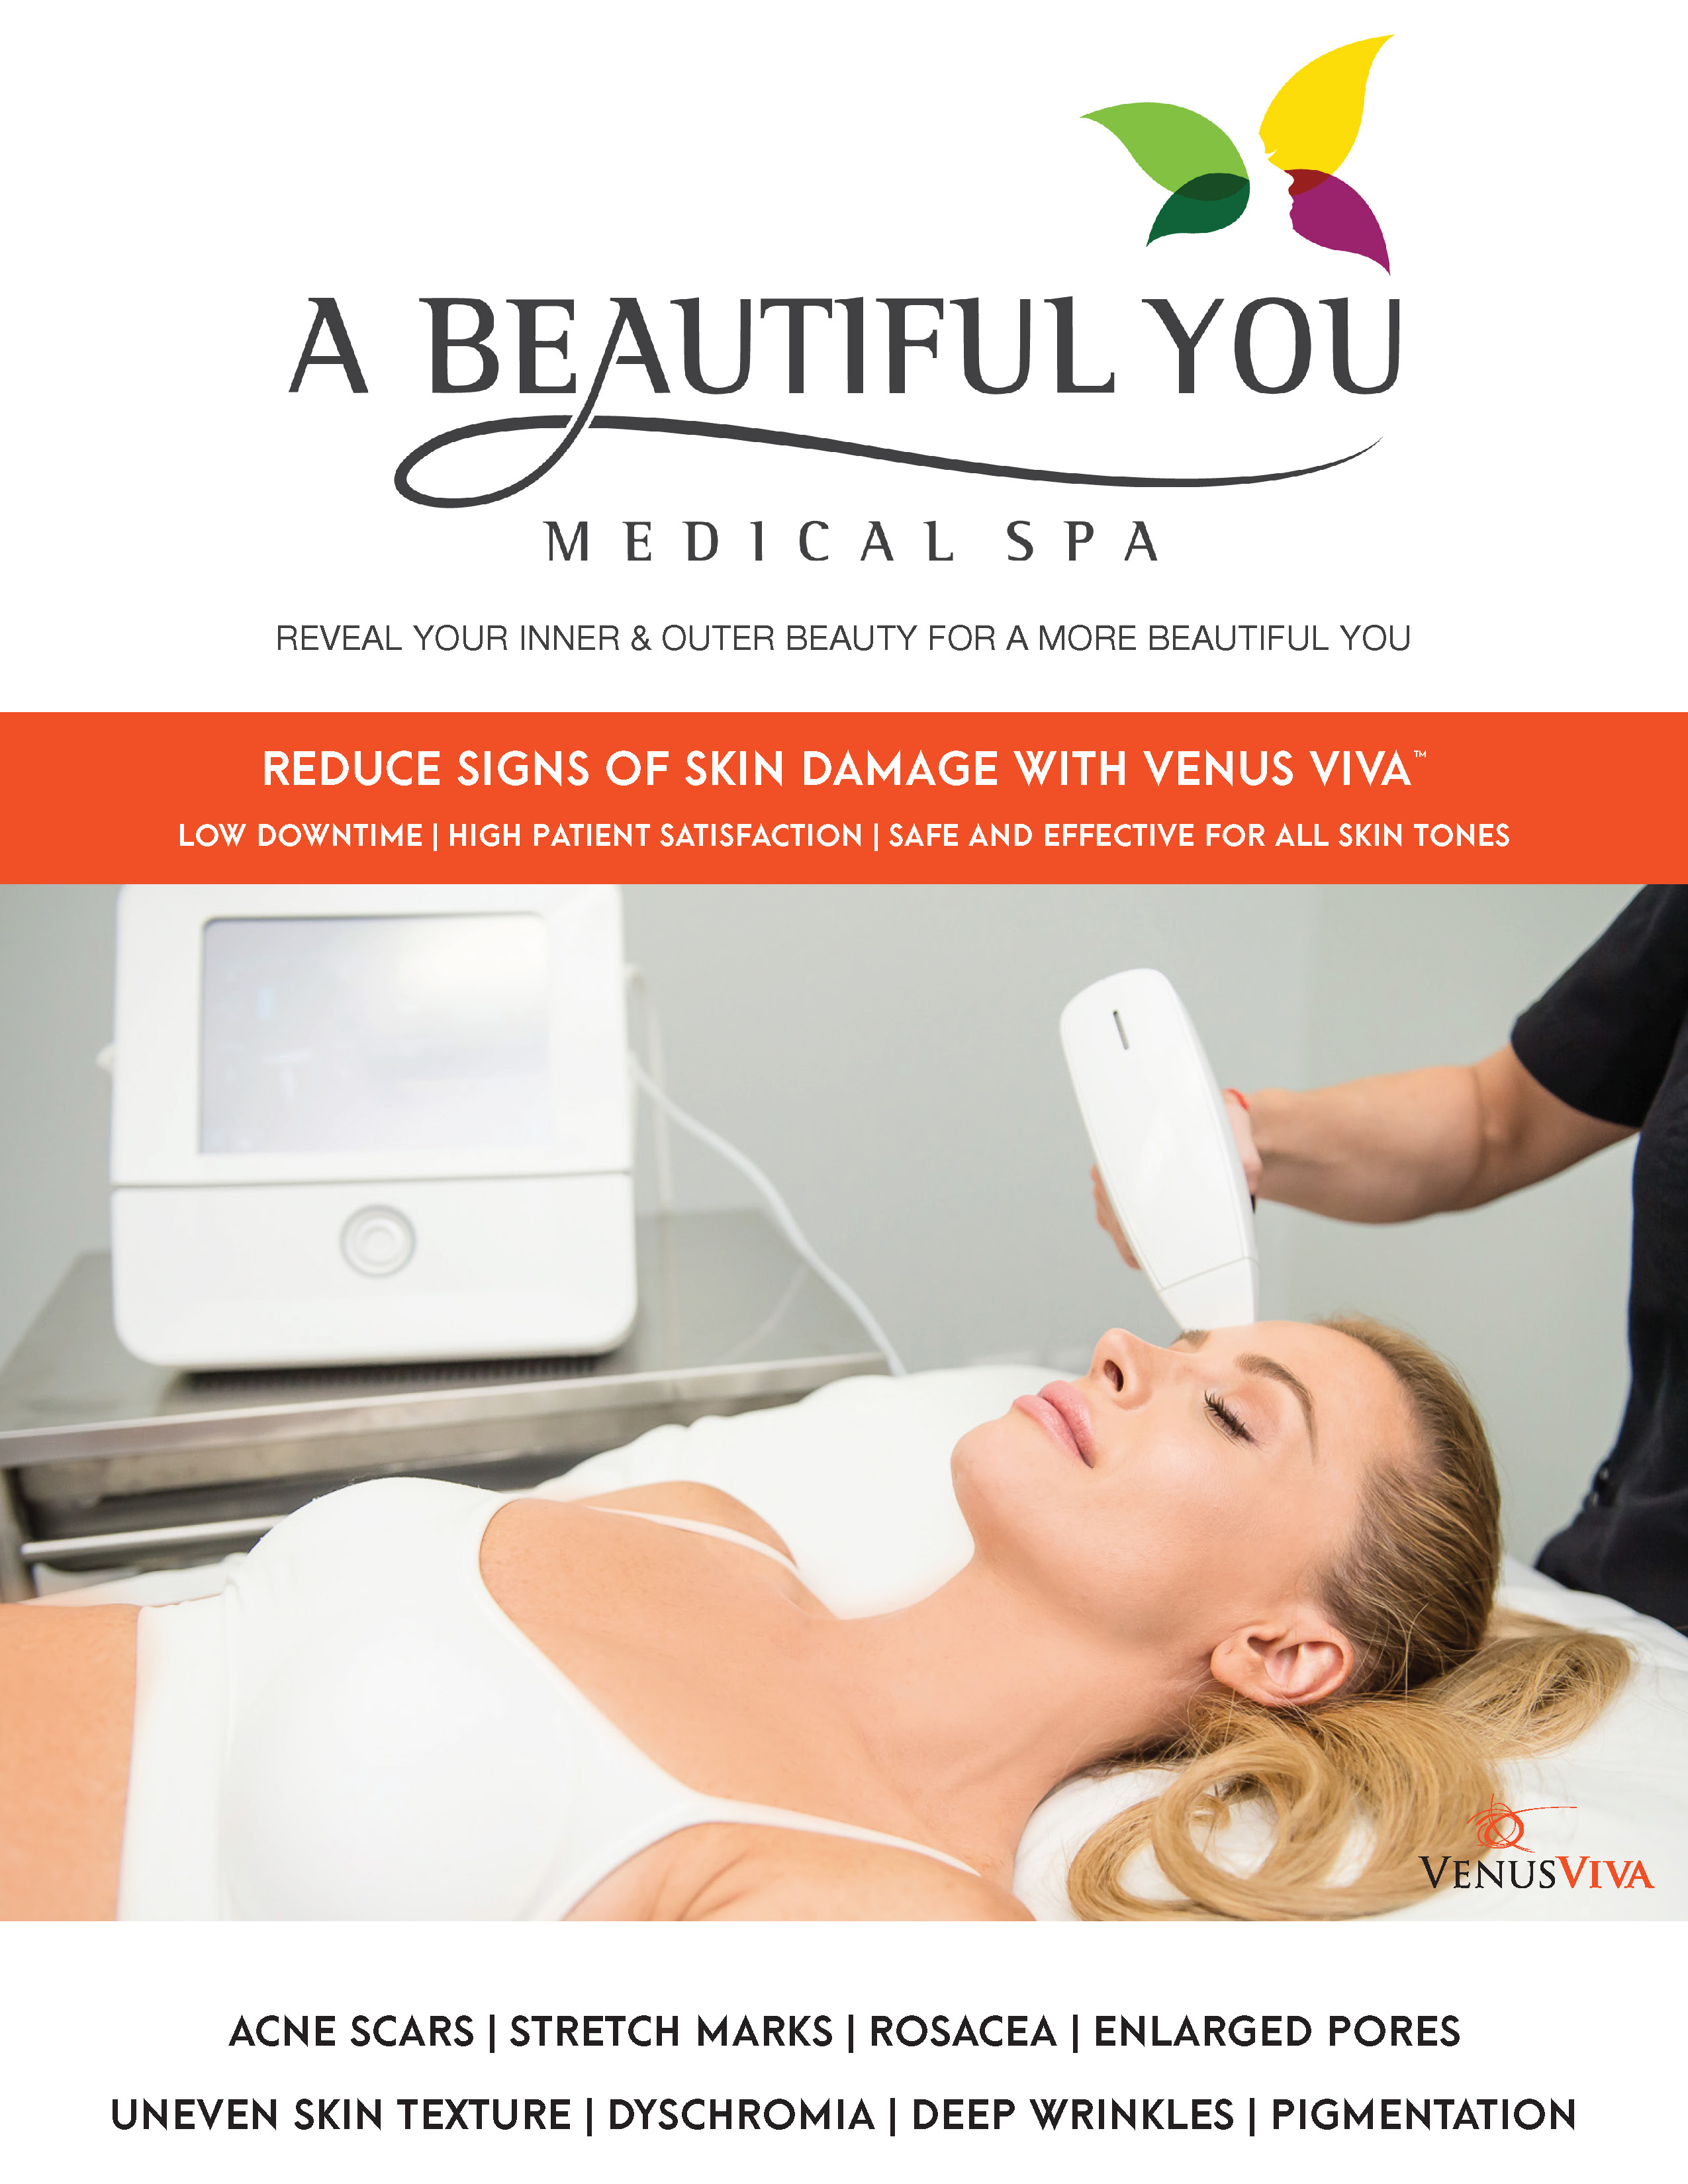 A Beautiful You Medical Spa image 10